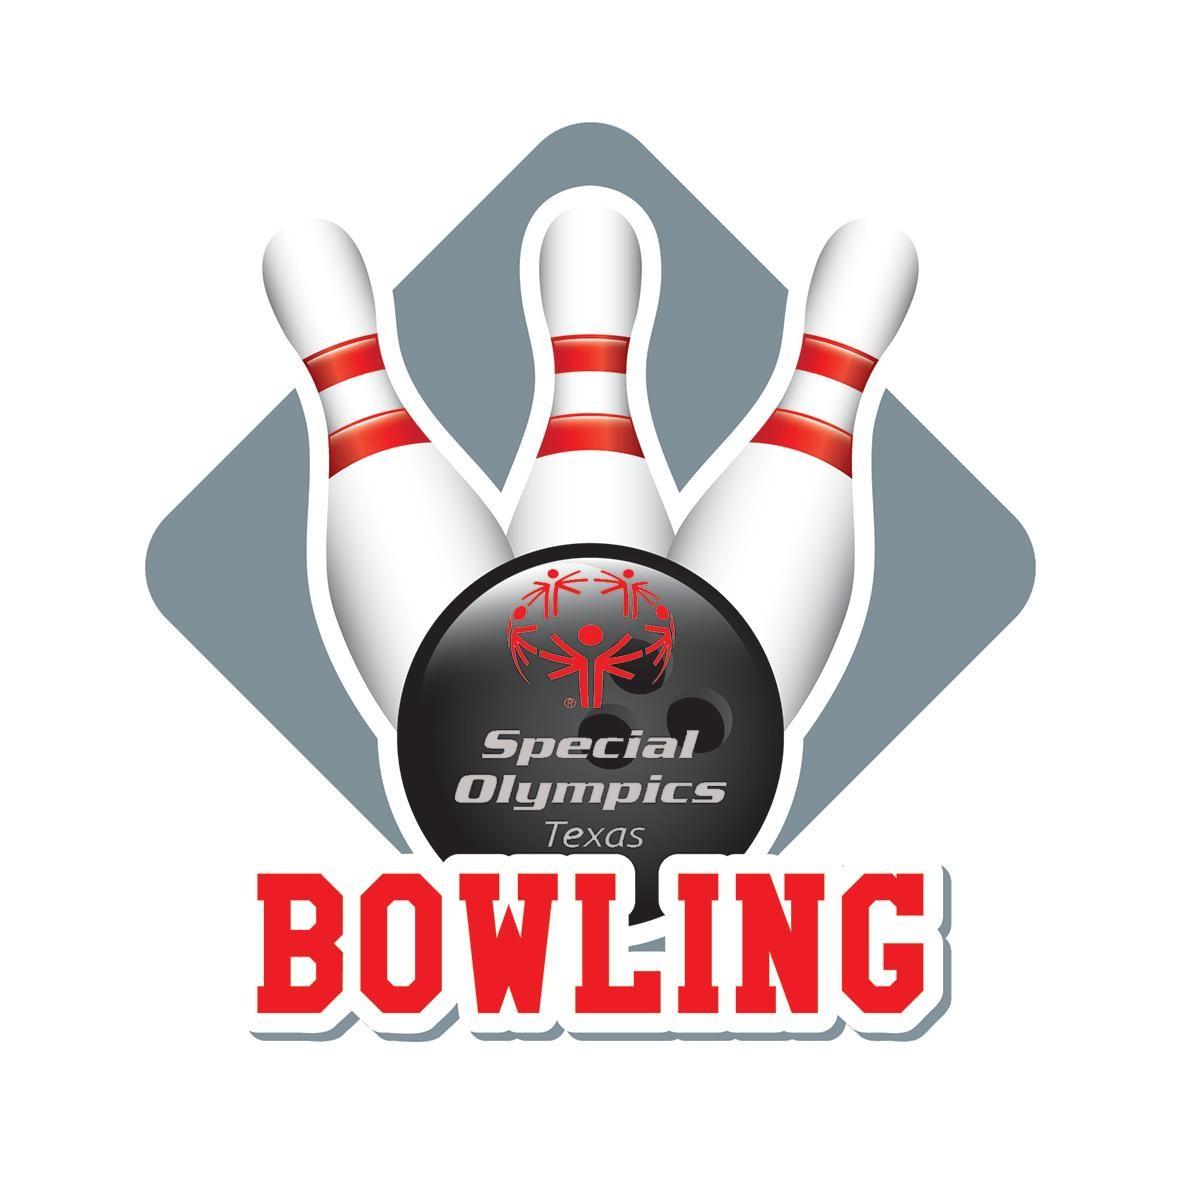 Special Olymoics Bowling.jpg